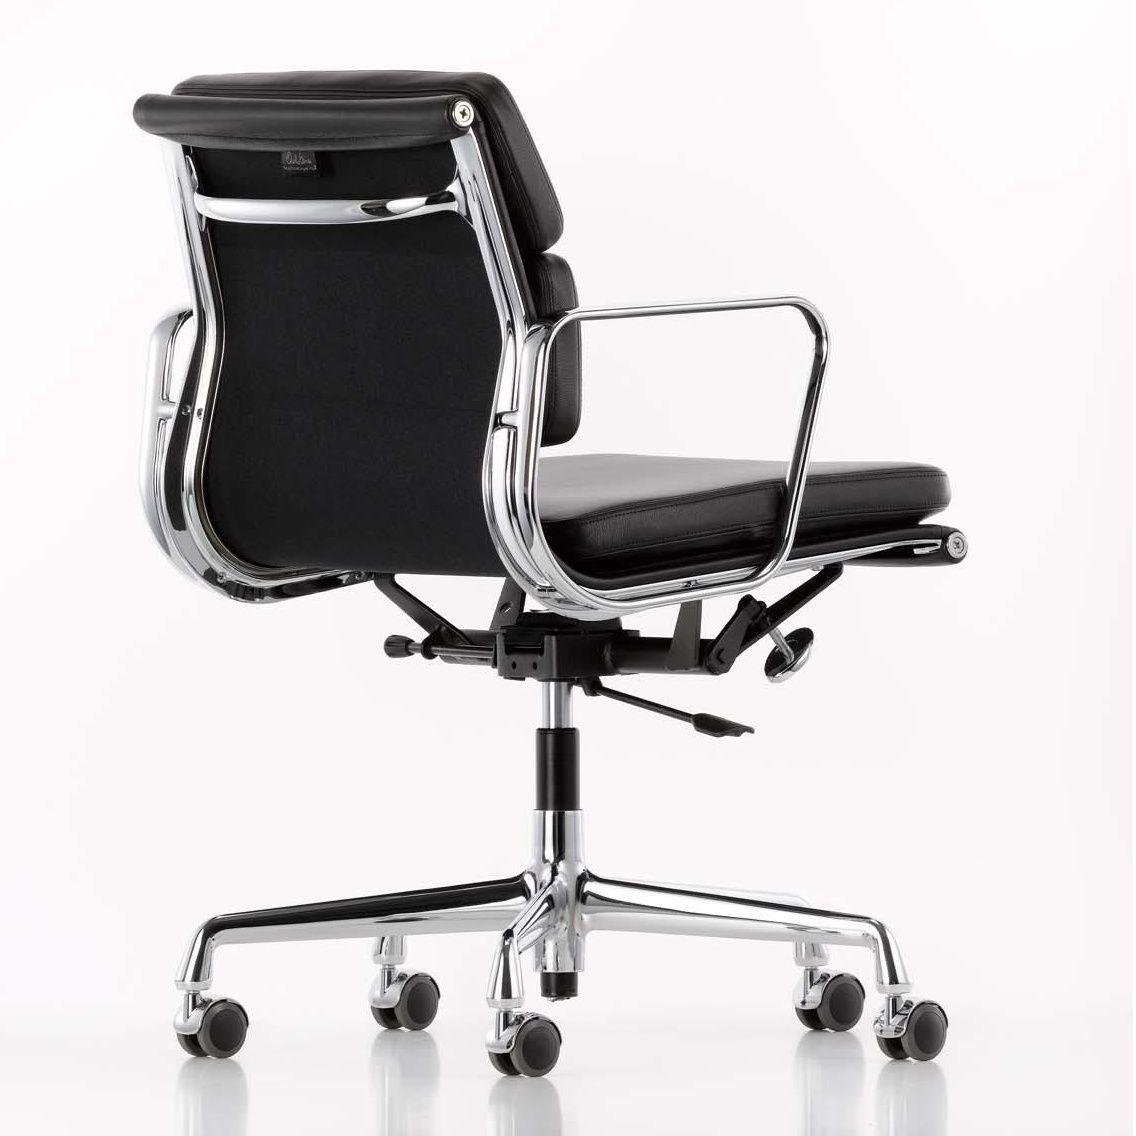 Ea 217 soft pad eames alu chair office chair luxury